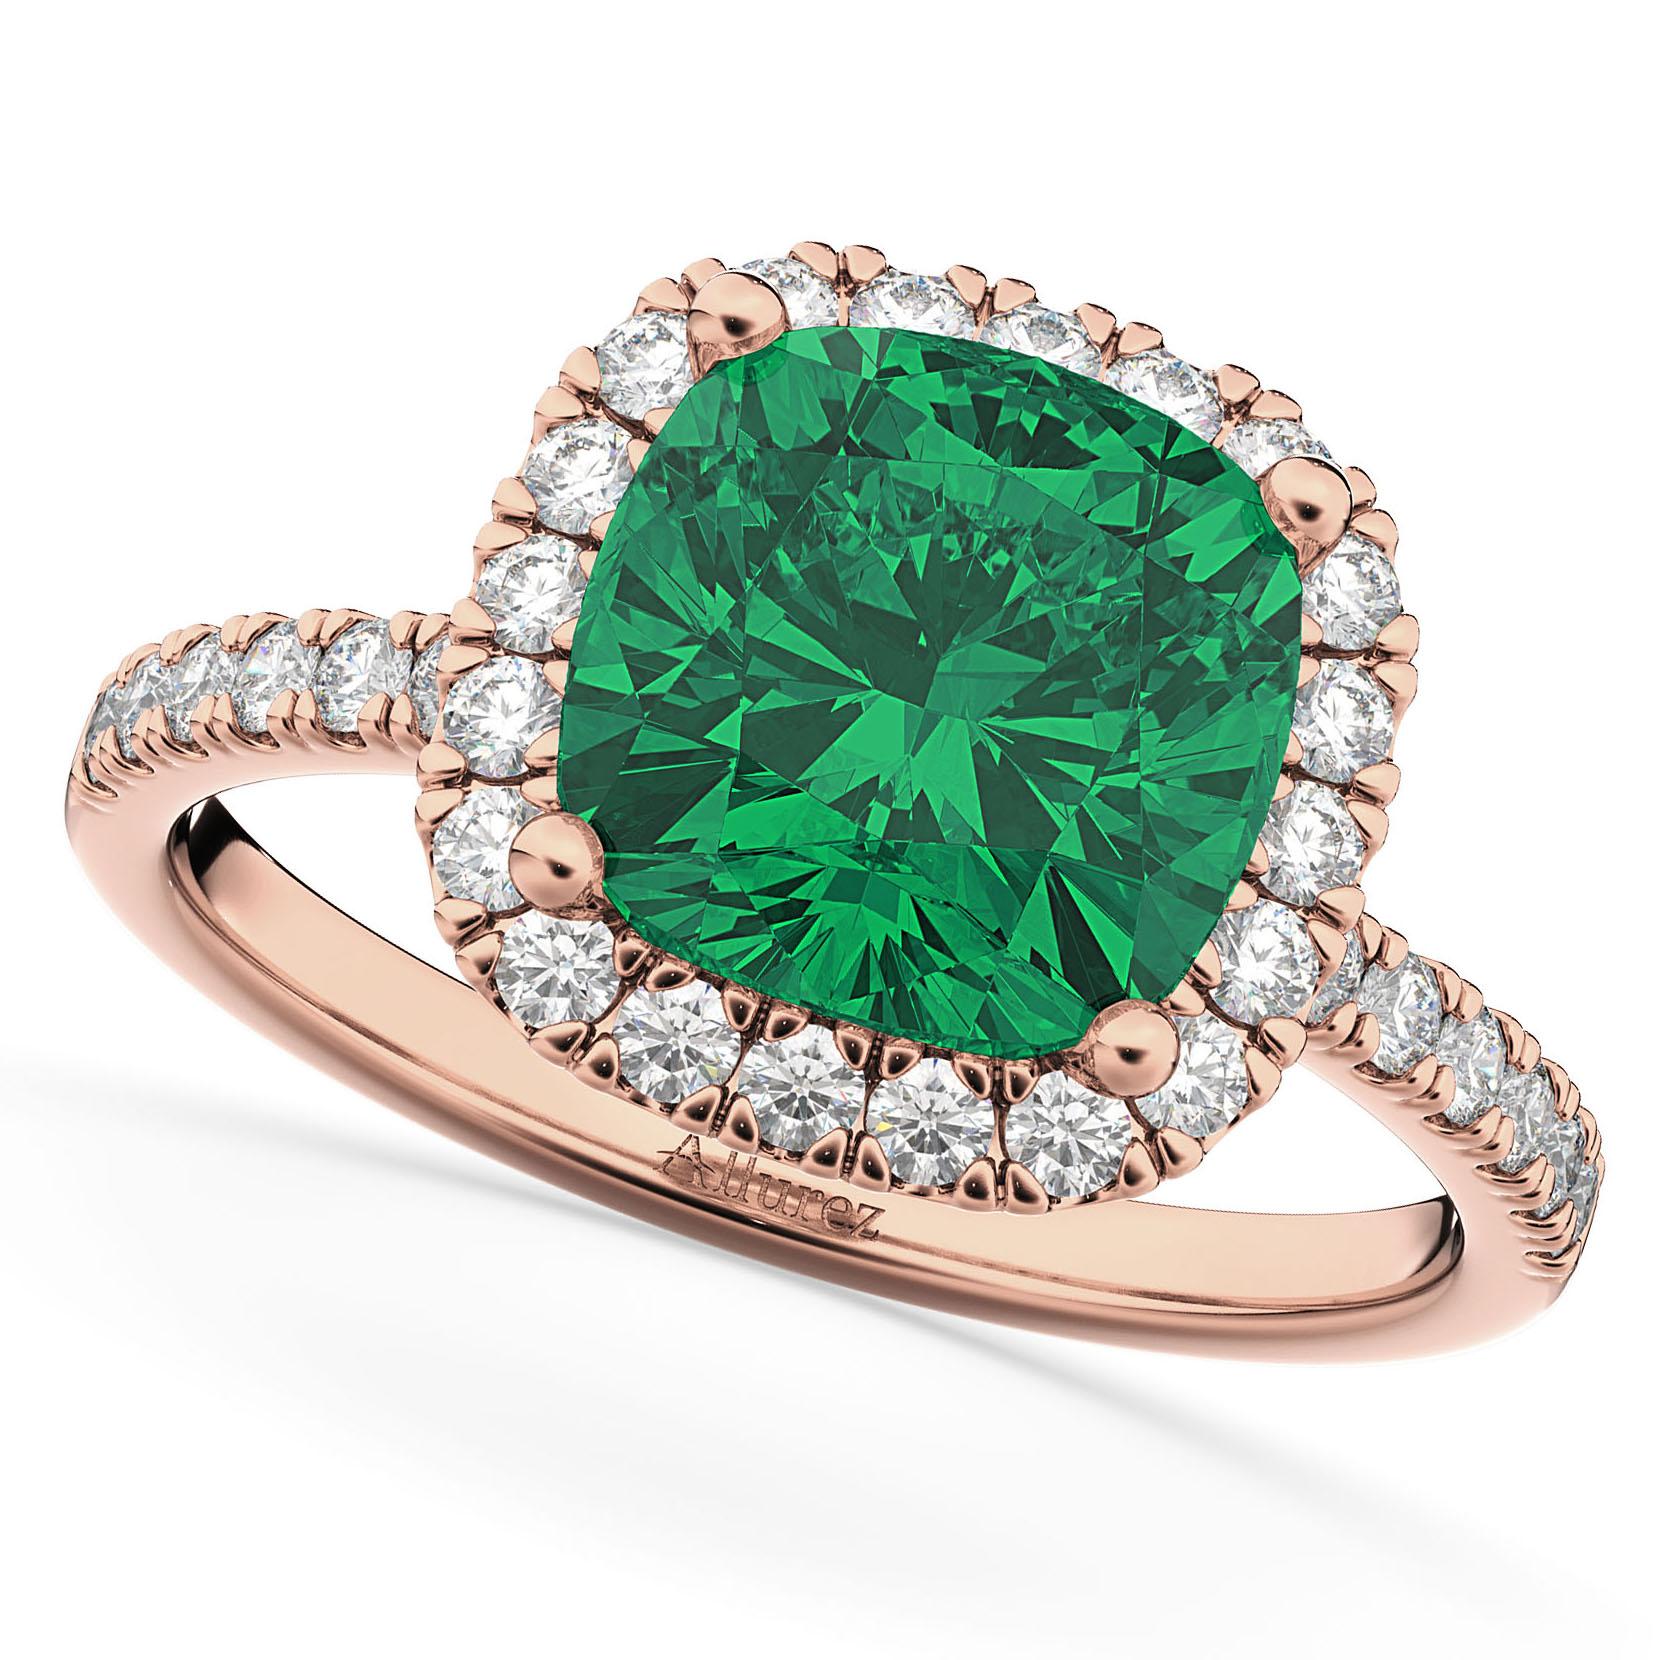 Emerald Cut Halo Diamond Engagement Rings: Cushion Cut Halo Emerald & Diamond Engagement Ring 14k